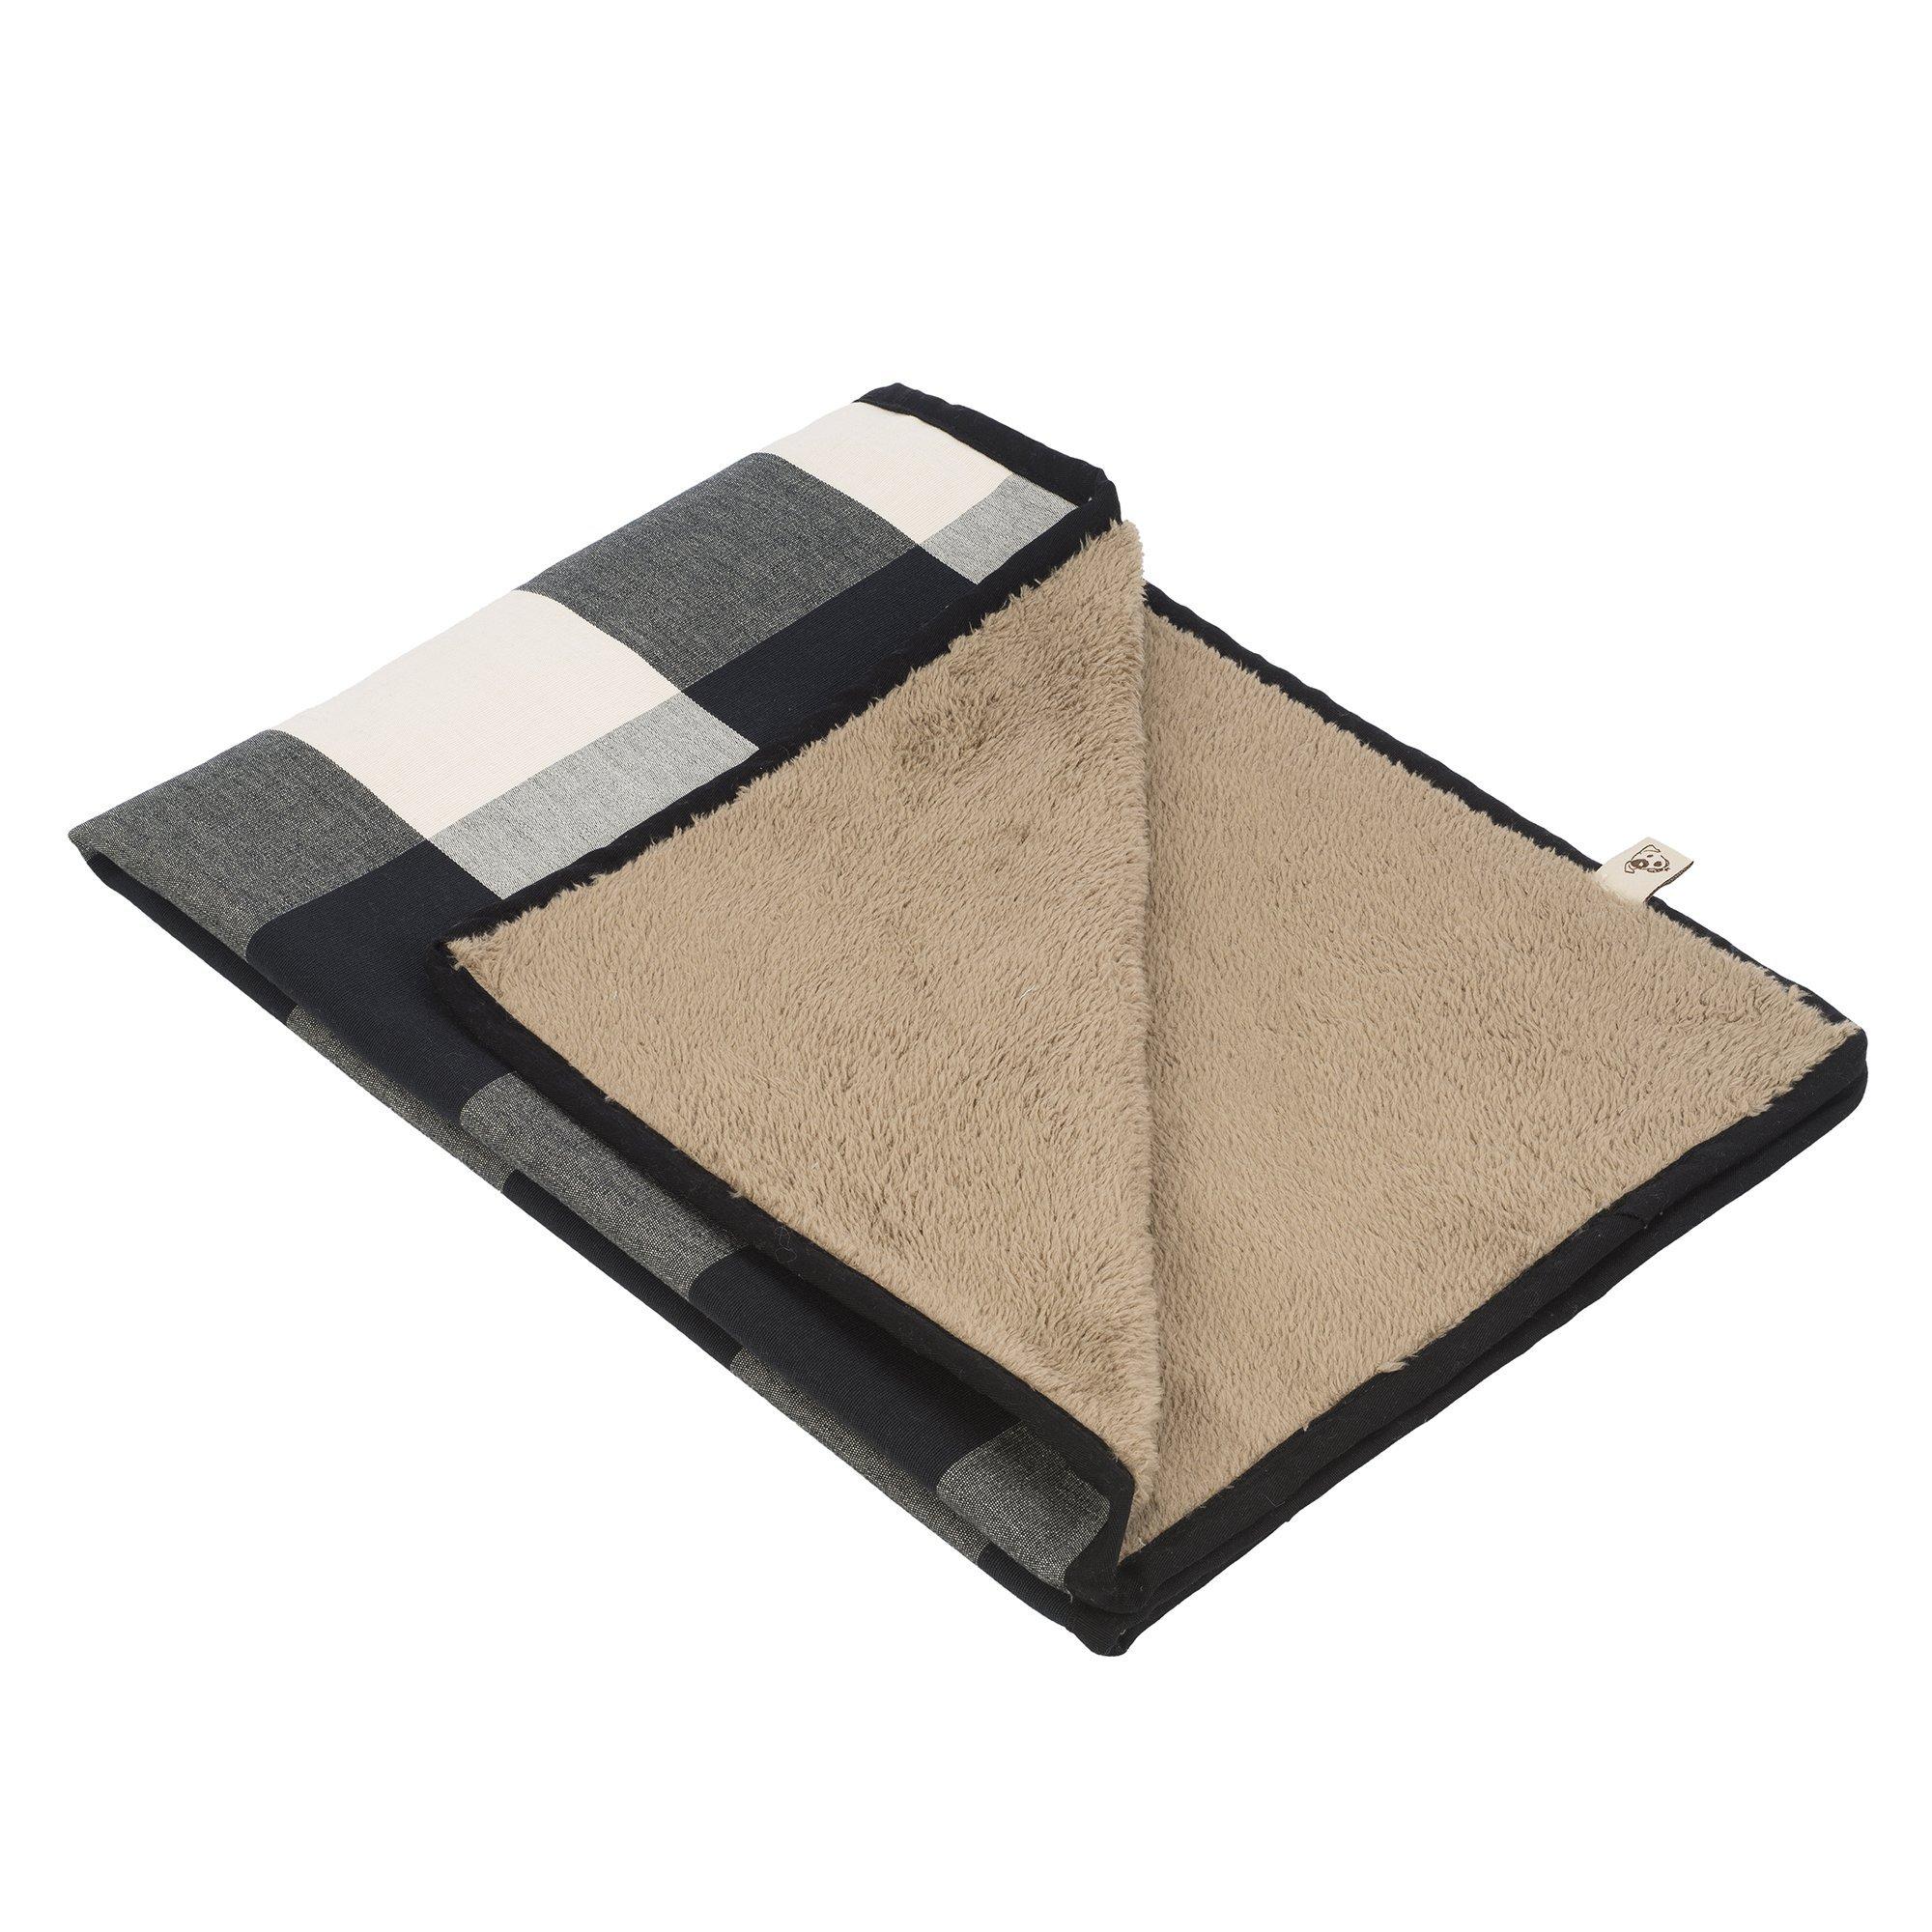 Jax and Bones Buffalo Check Standard Pet Blanket, Large, Black